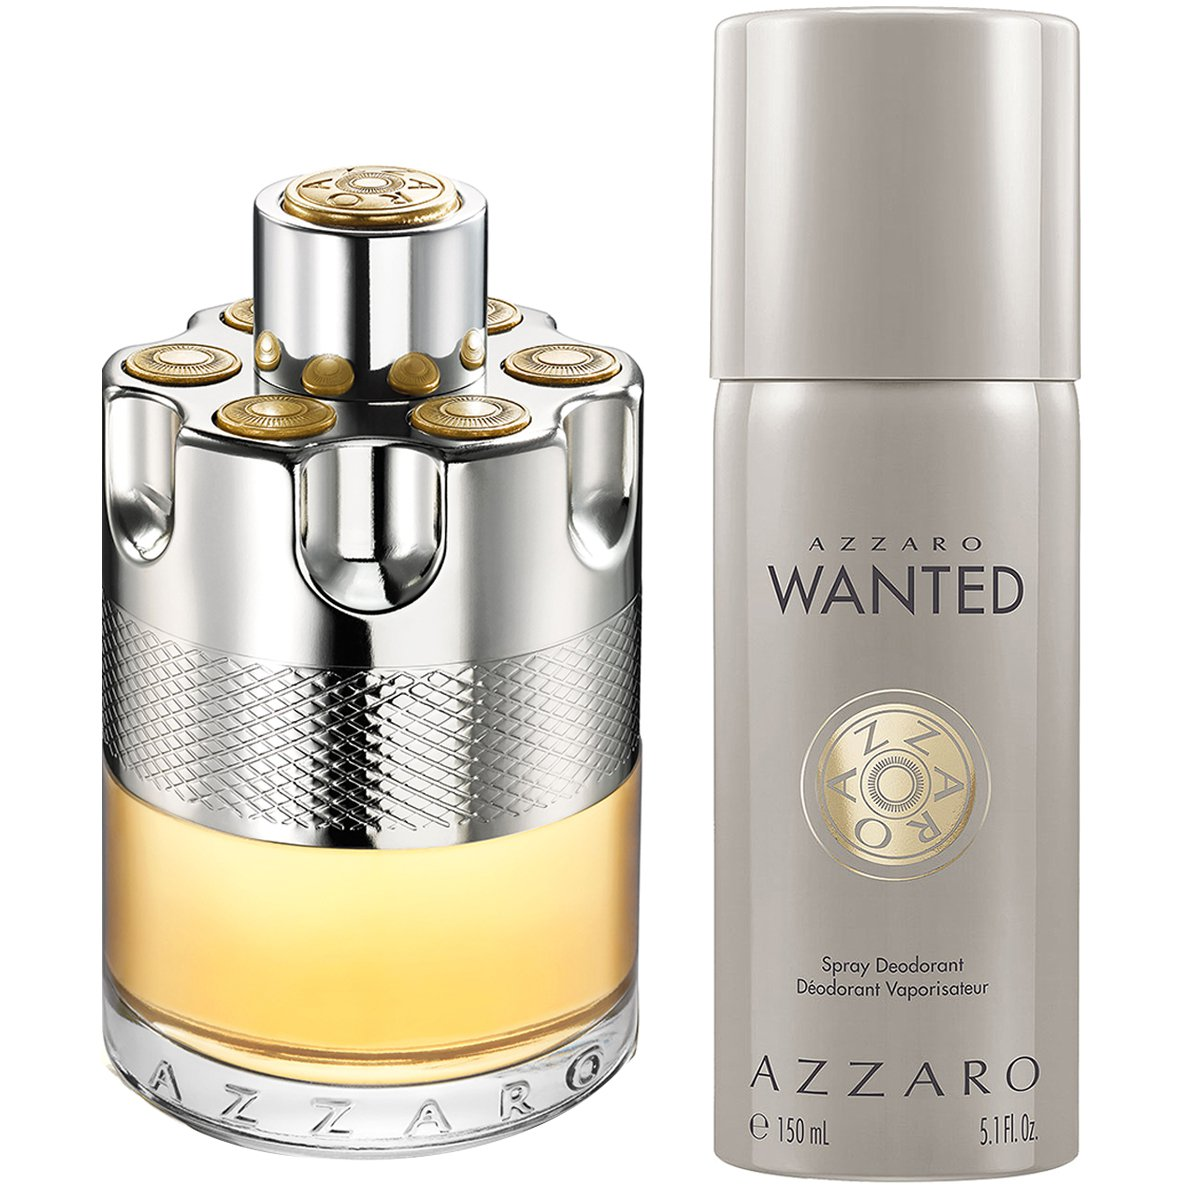 30d75fa3a5 Kit Azzaro Perfume Masculino Wanted EDT 100ml + Desodorante Masculino  Wanted 150ml